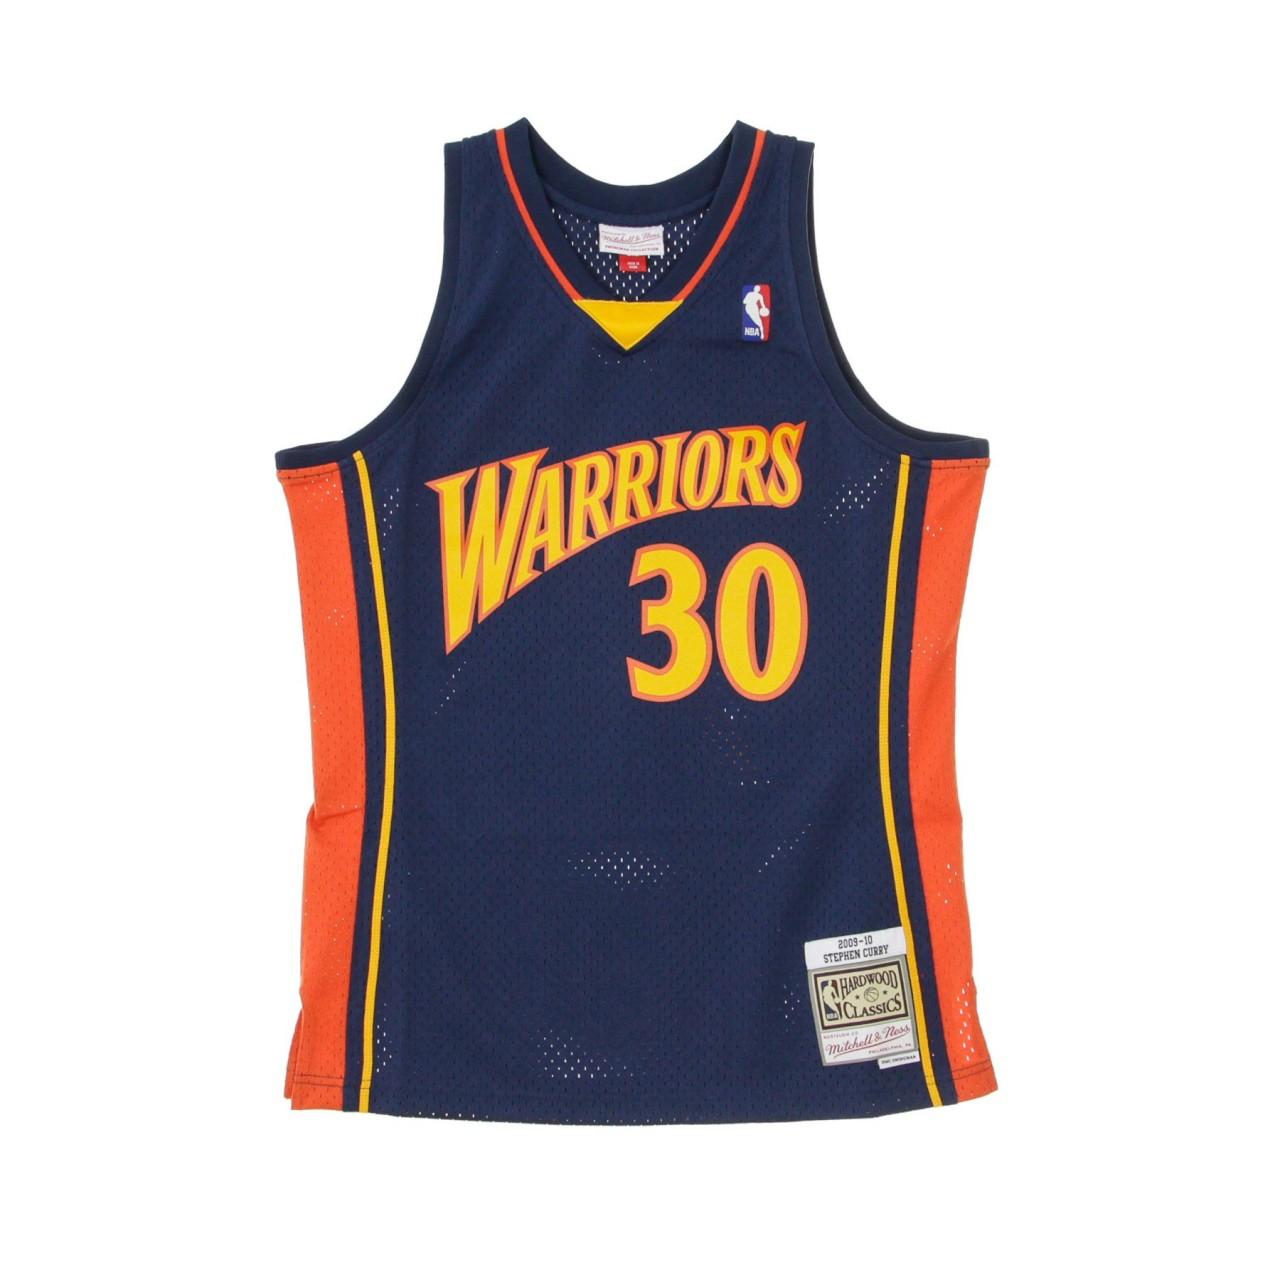 MITCHELL & NESS NBA SWINGMAN JERSEY HARDWOOD CLASSICS NO.30 STEPHEN CURRY 2009-10 GOLWAR ROAD SMJYGS18170-GSWNAVY09SCU